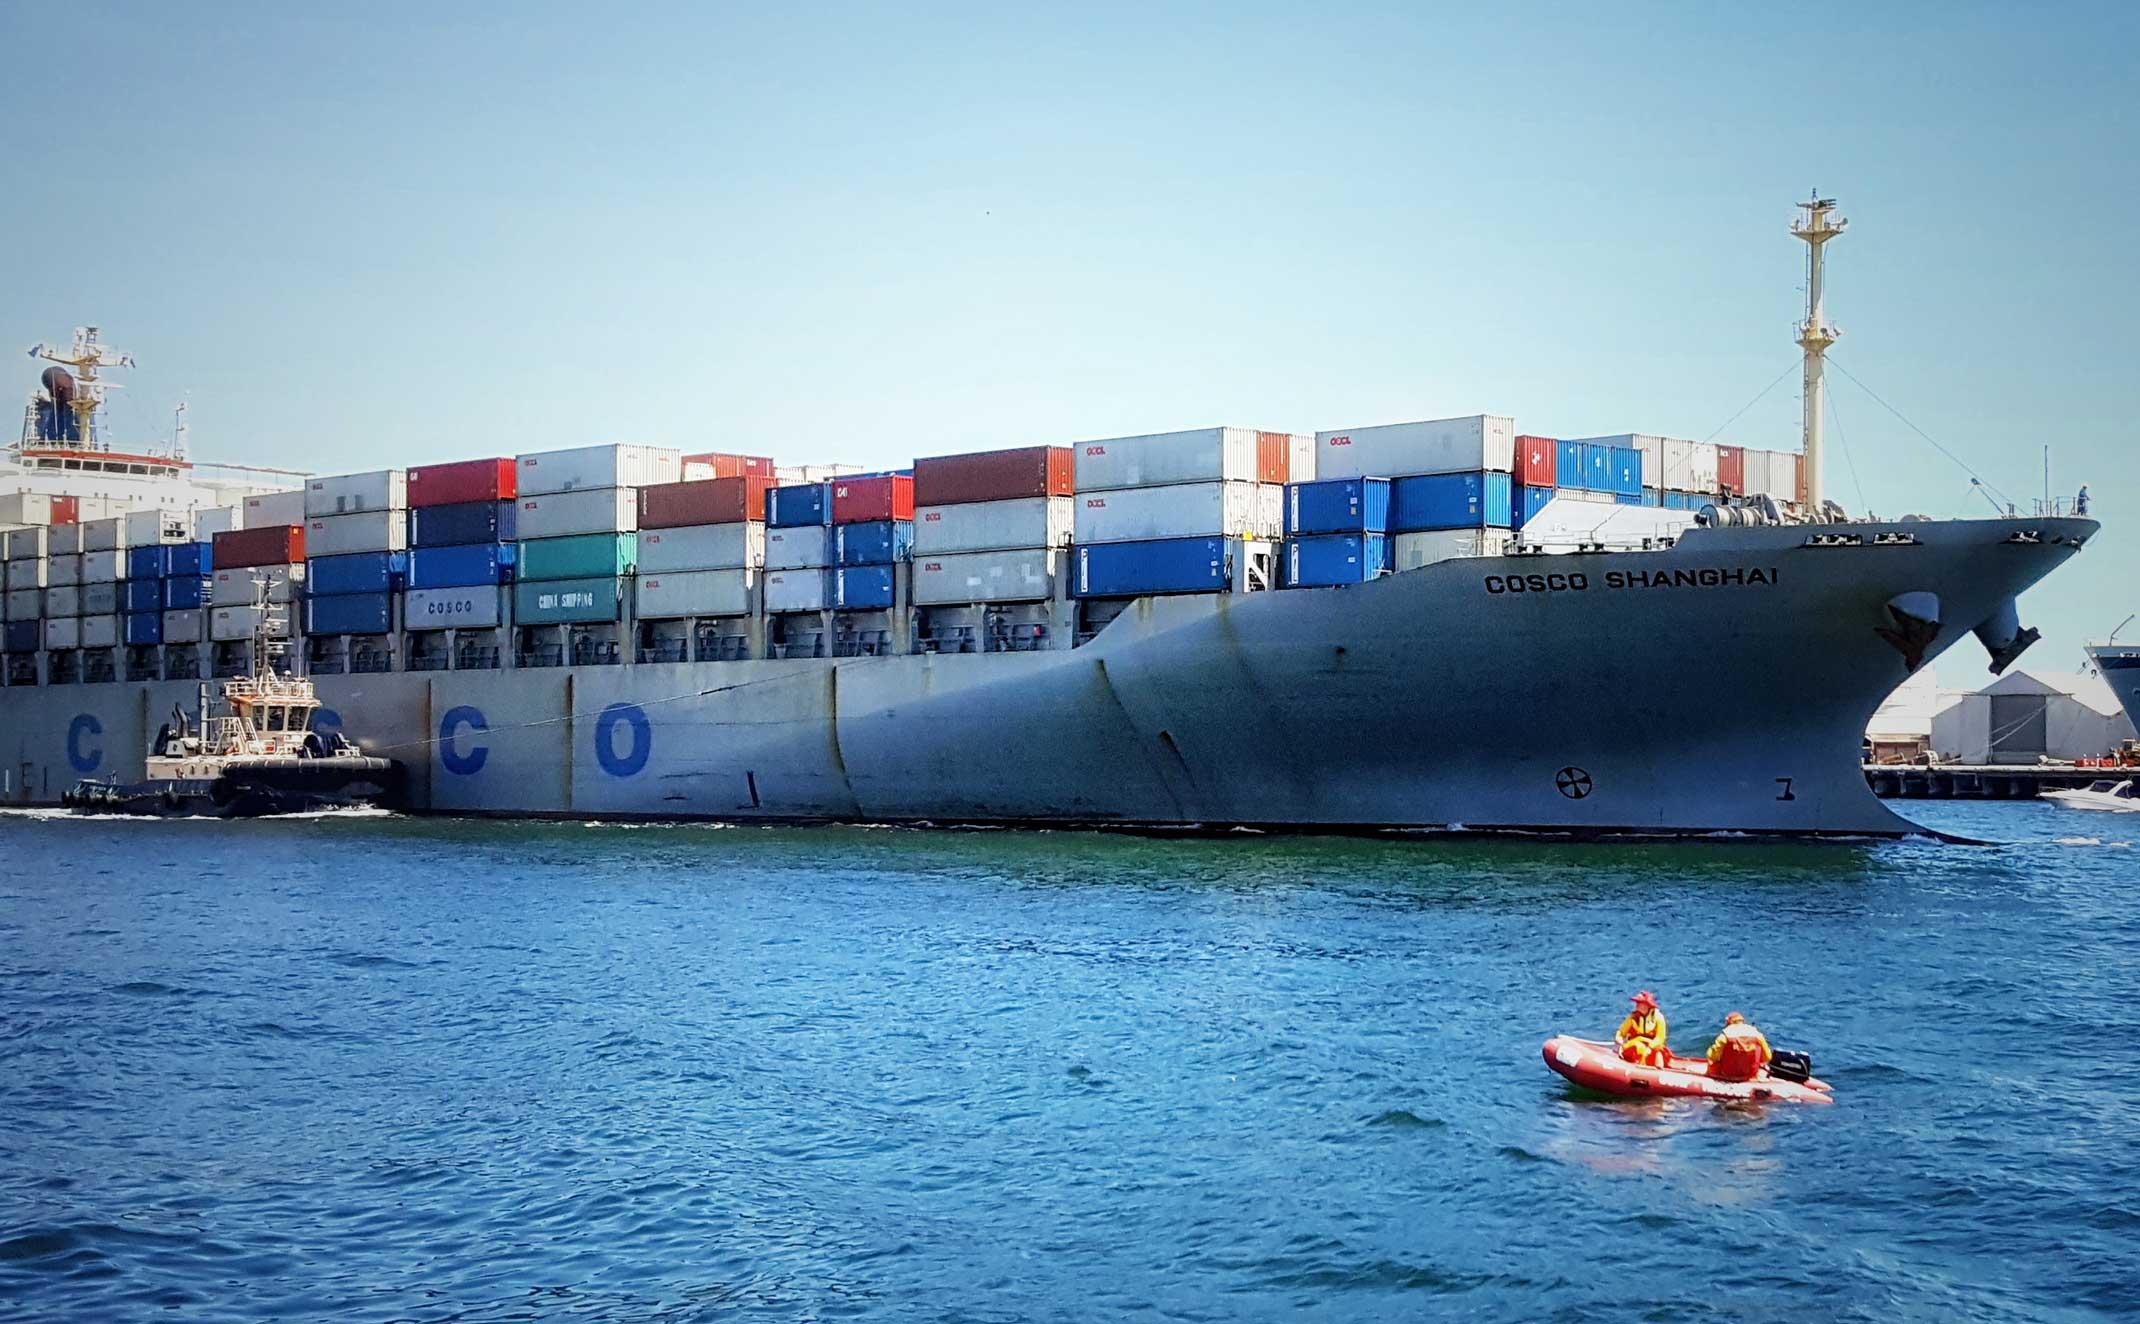 cosco-shanghai-ship-fremantle-port-fsn